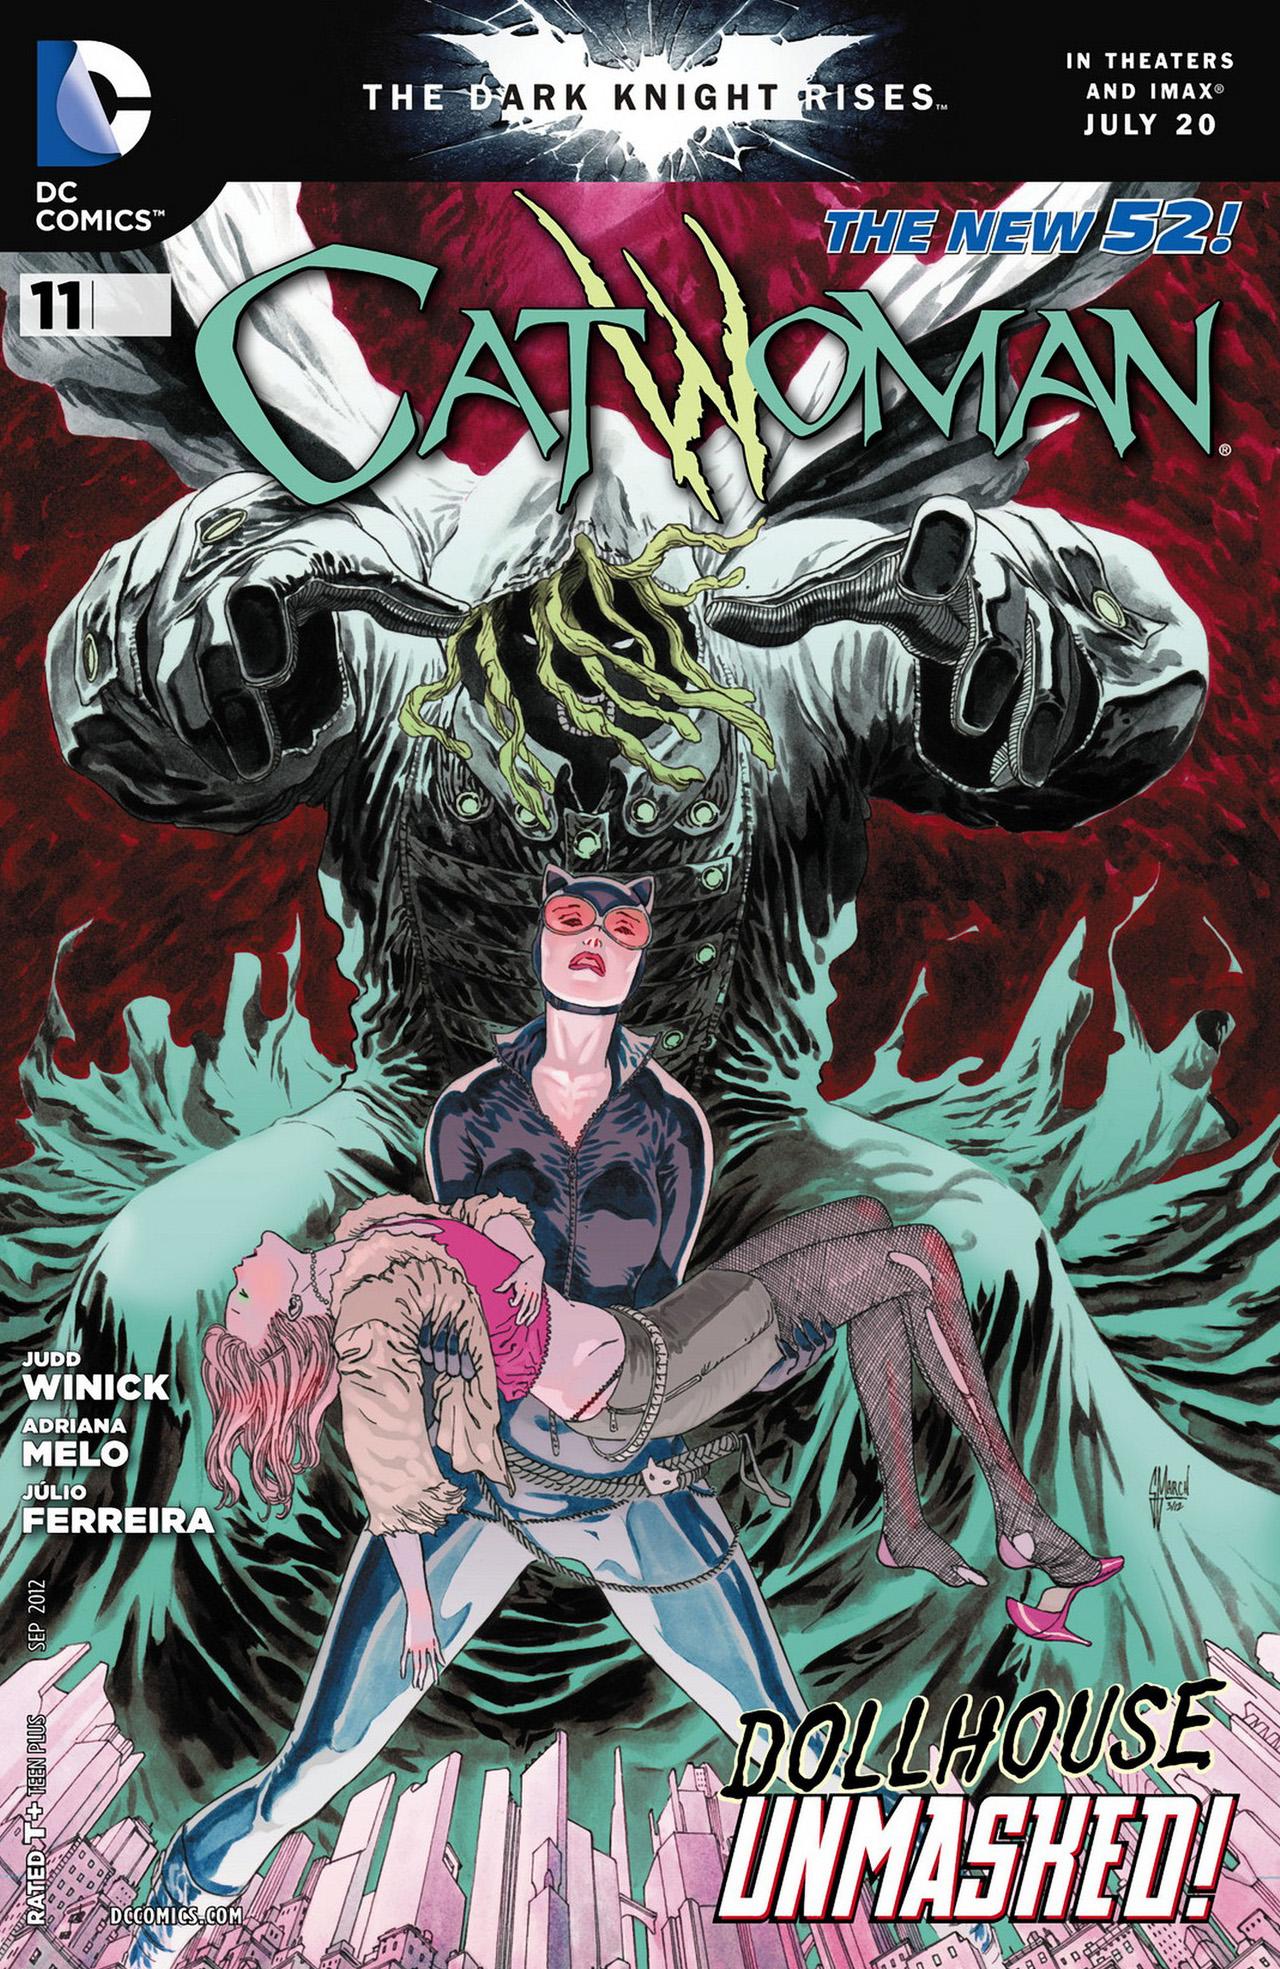 Catwoman Vol 4 11